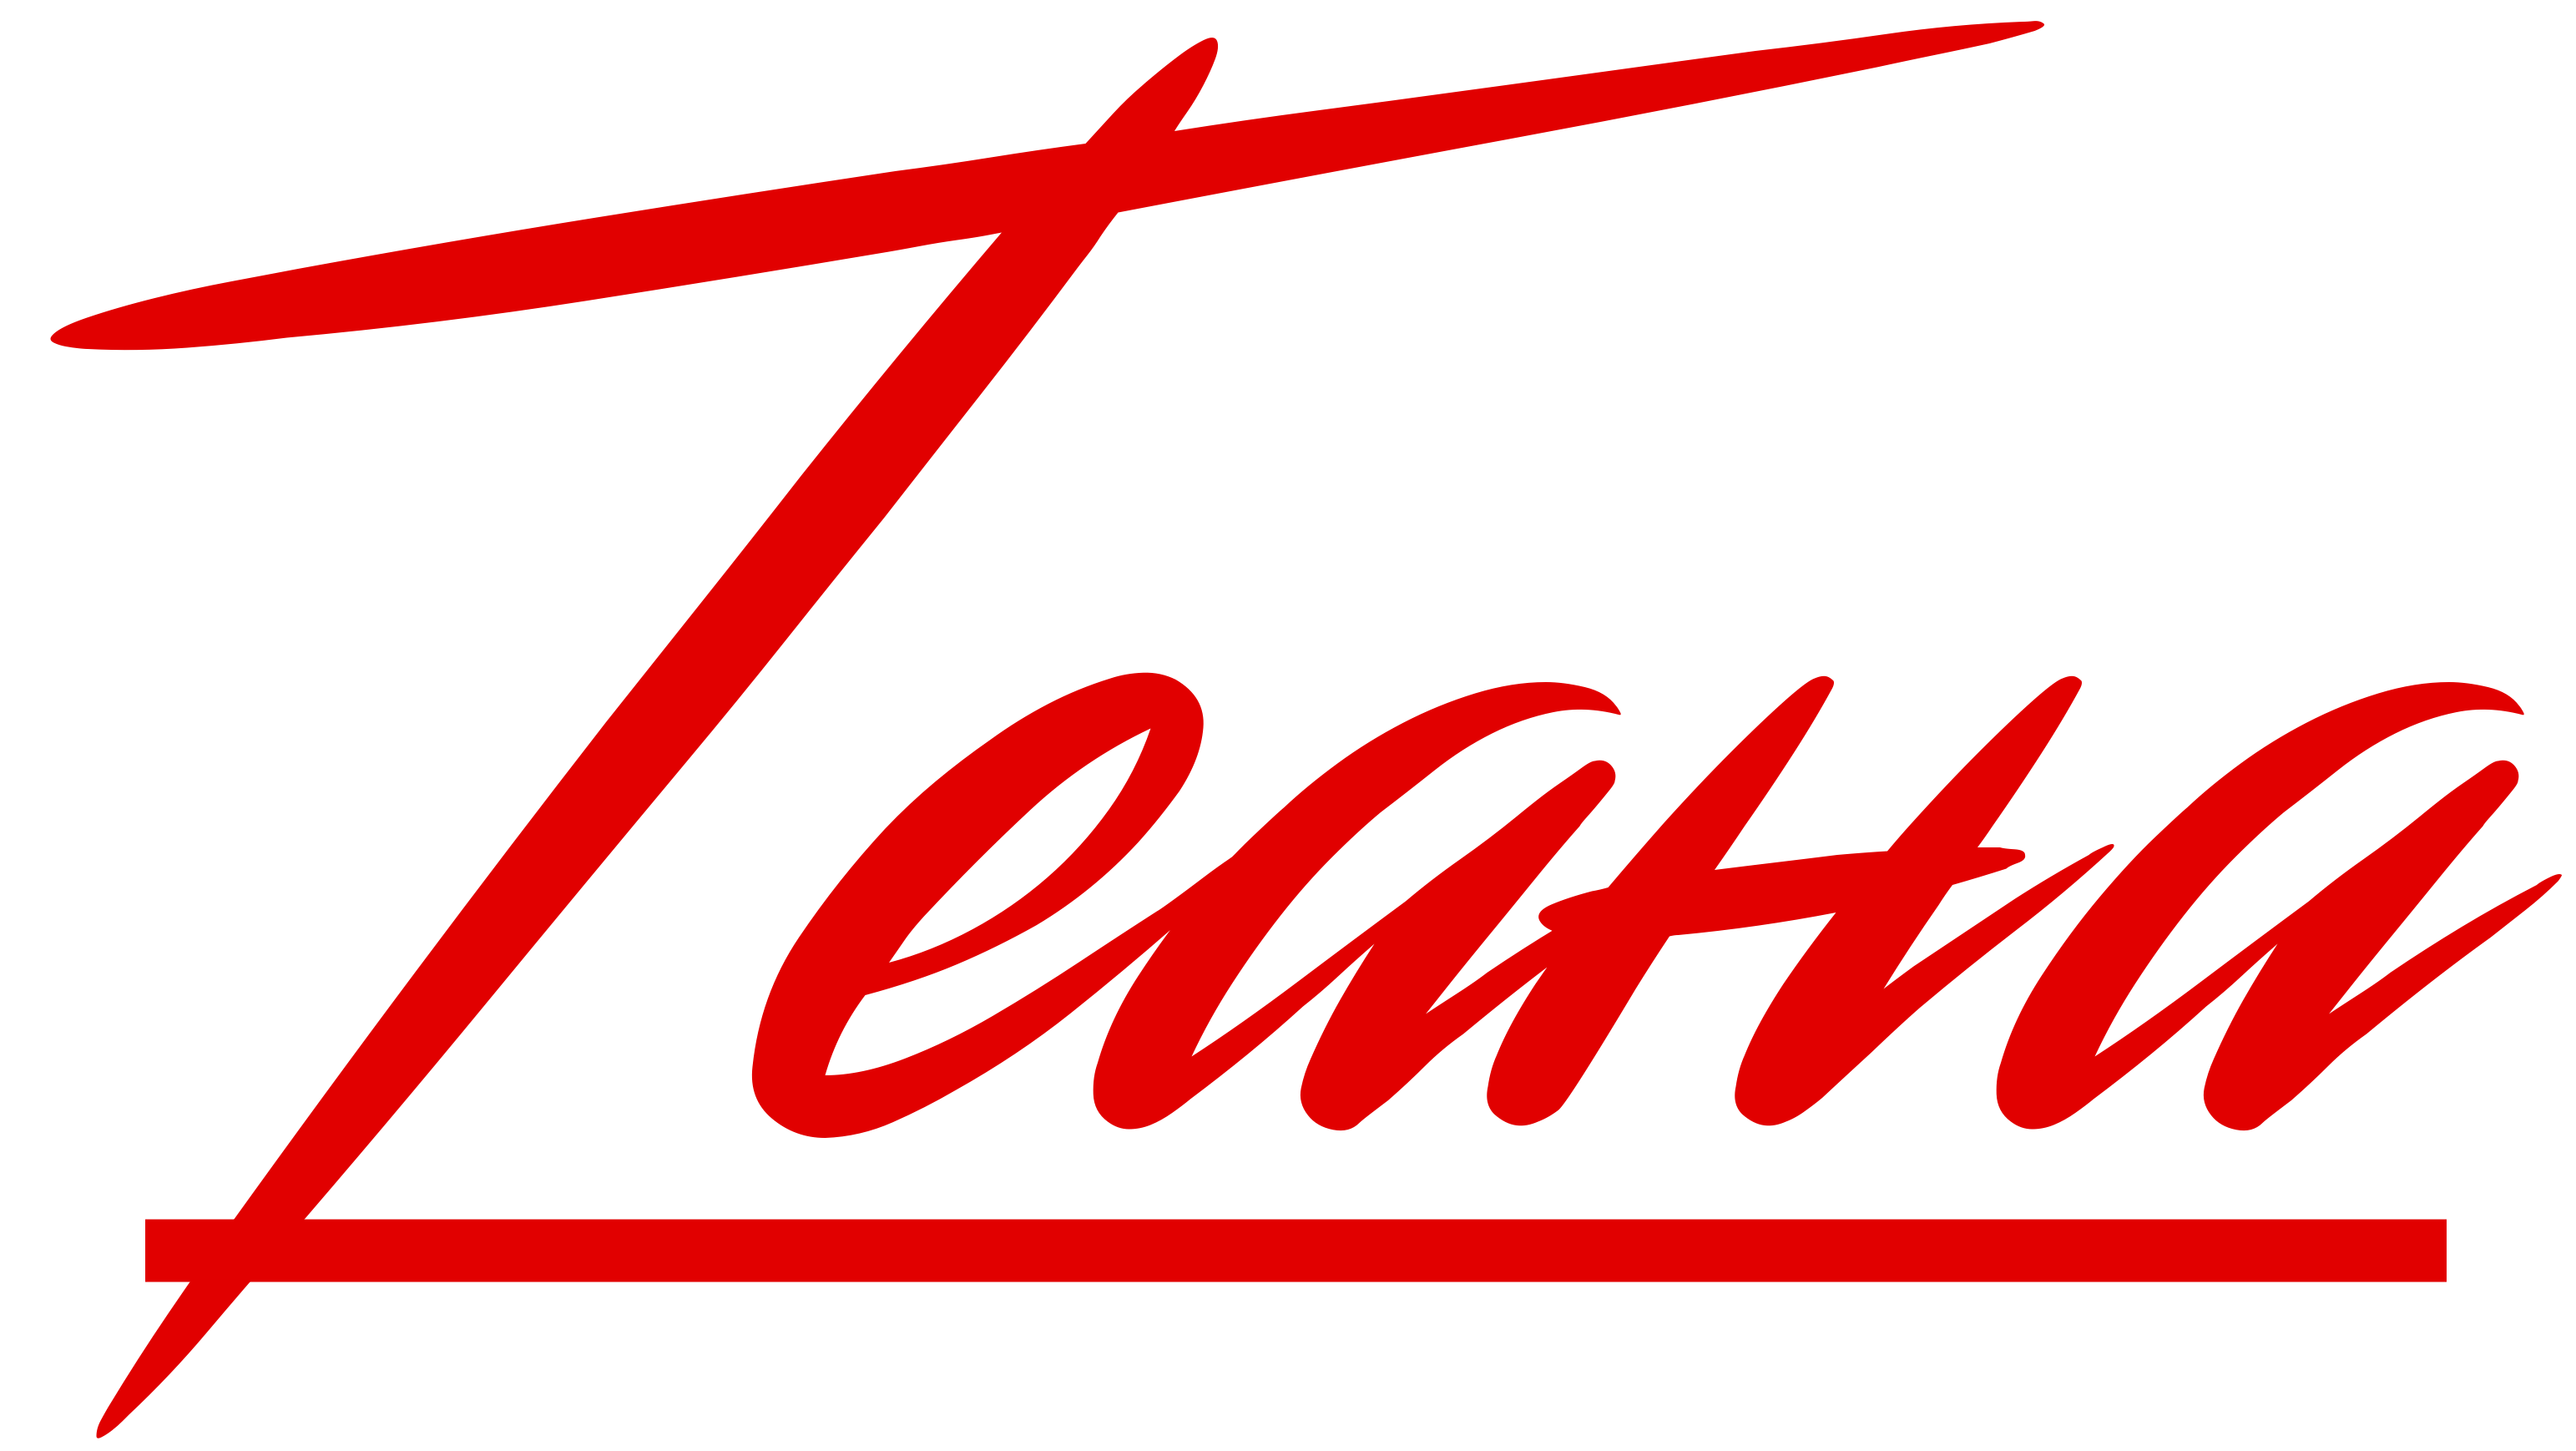 ТЕАНА